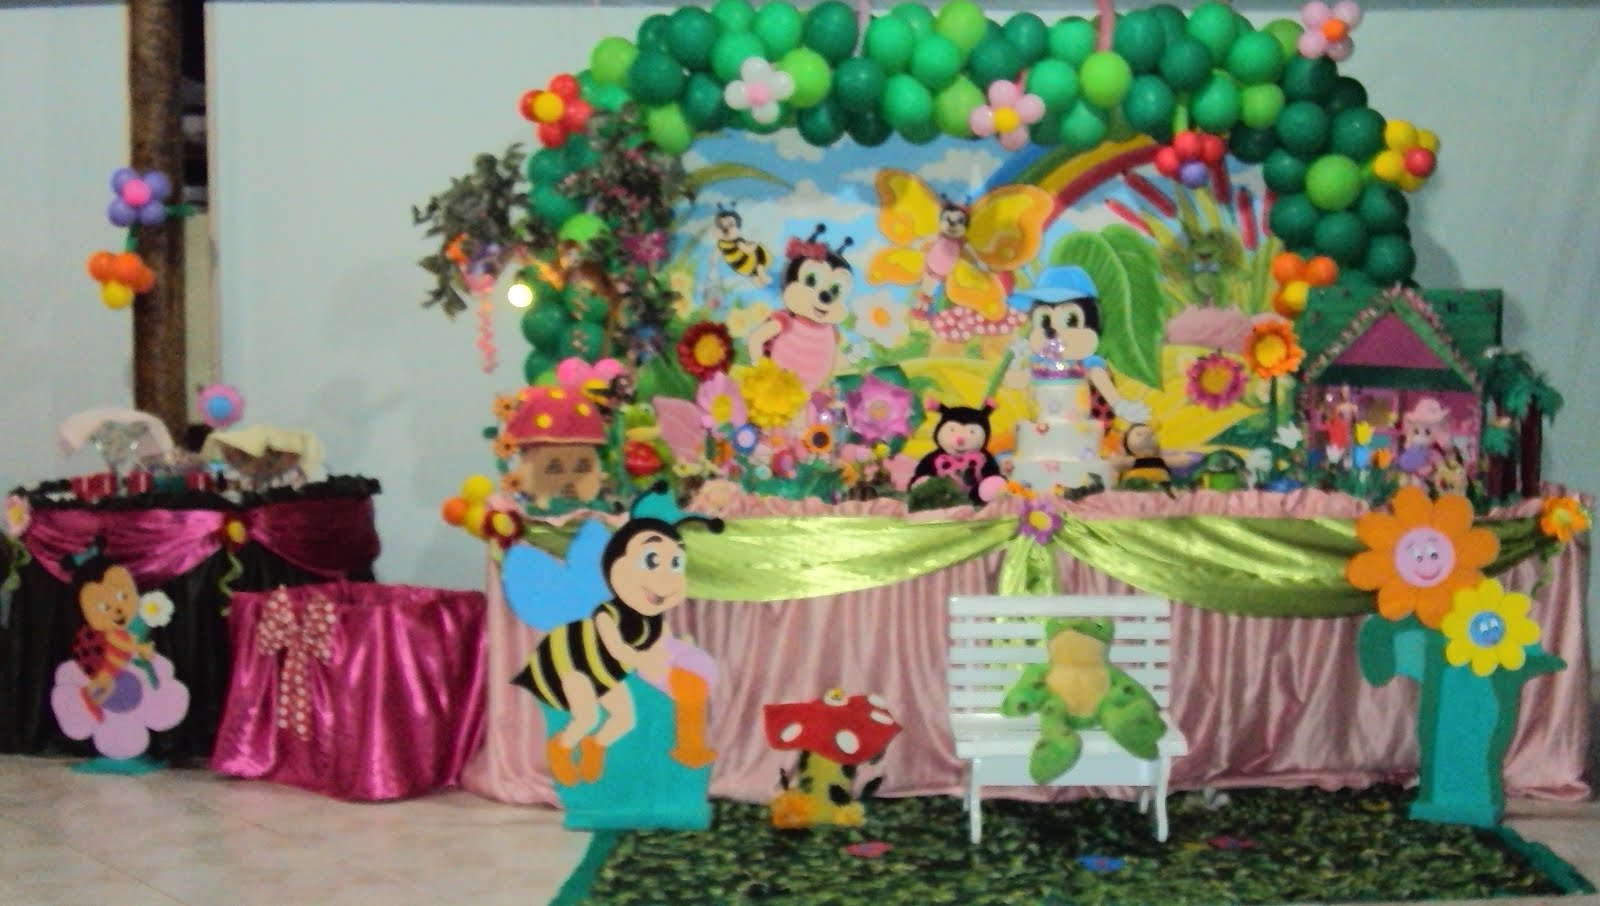 Sirlei Festas infantilRuaOreade 174 Moreninha III Tel(67)33932873